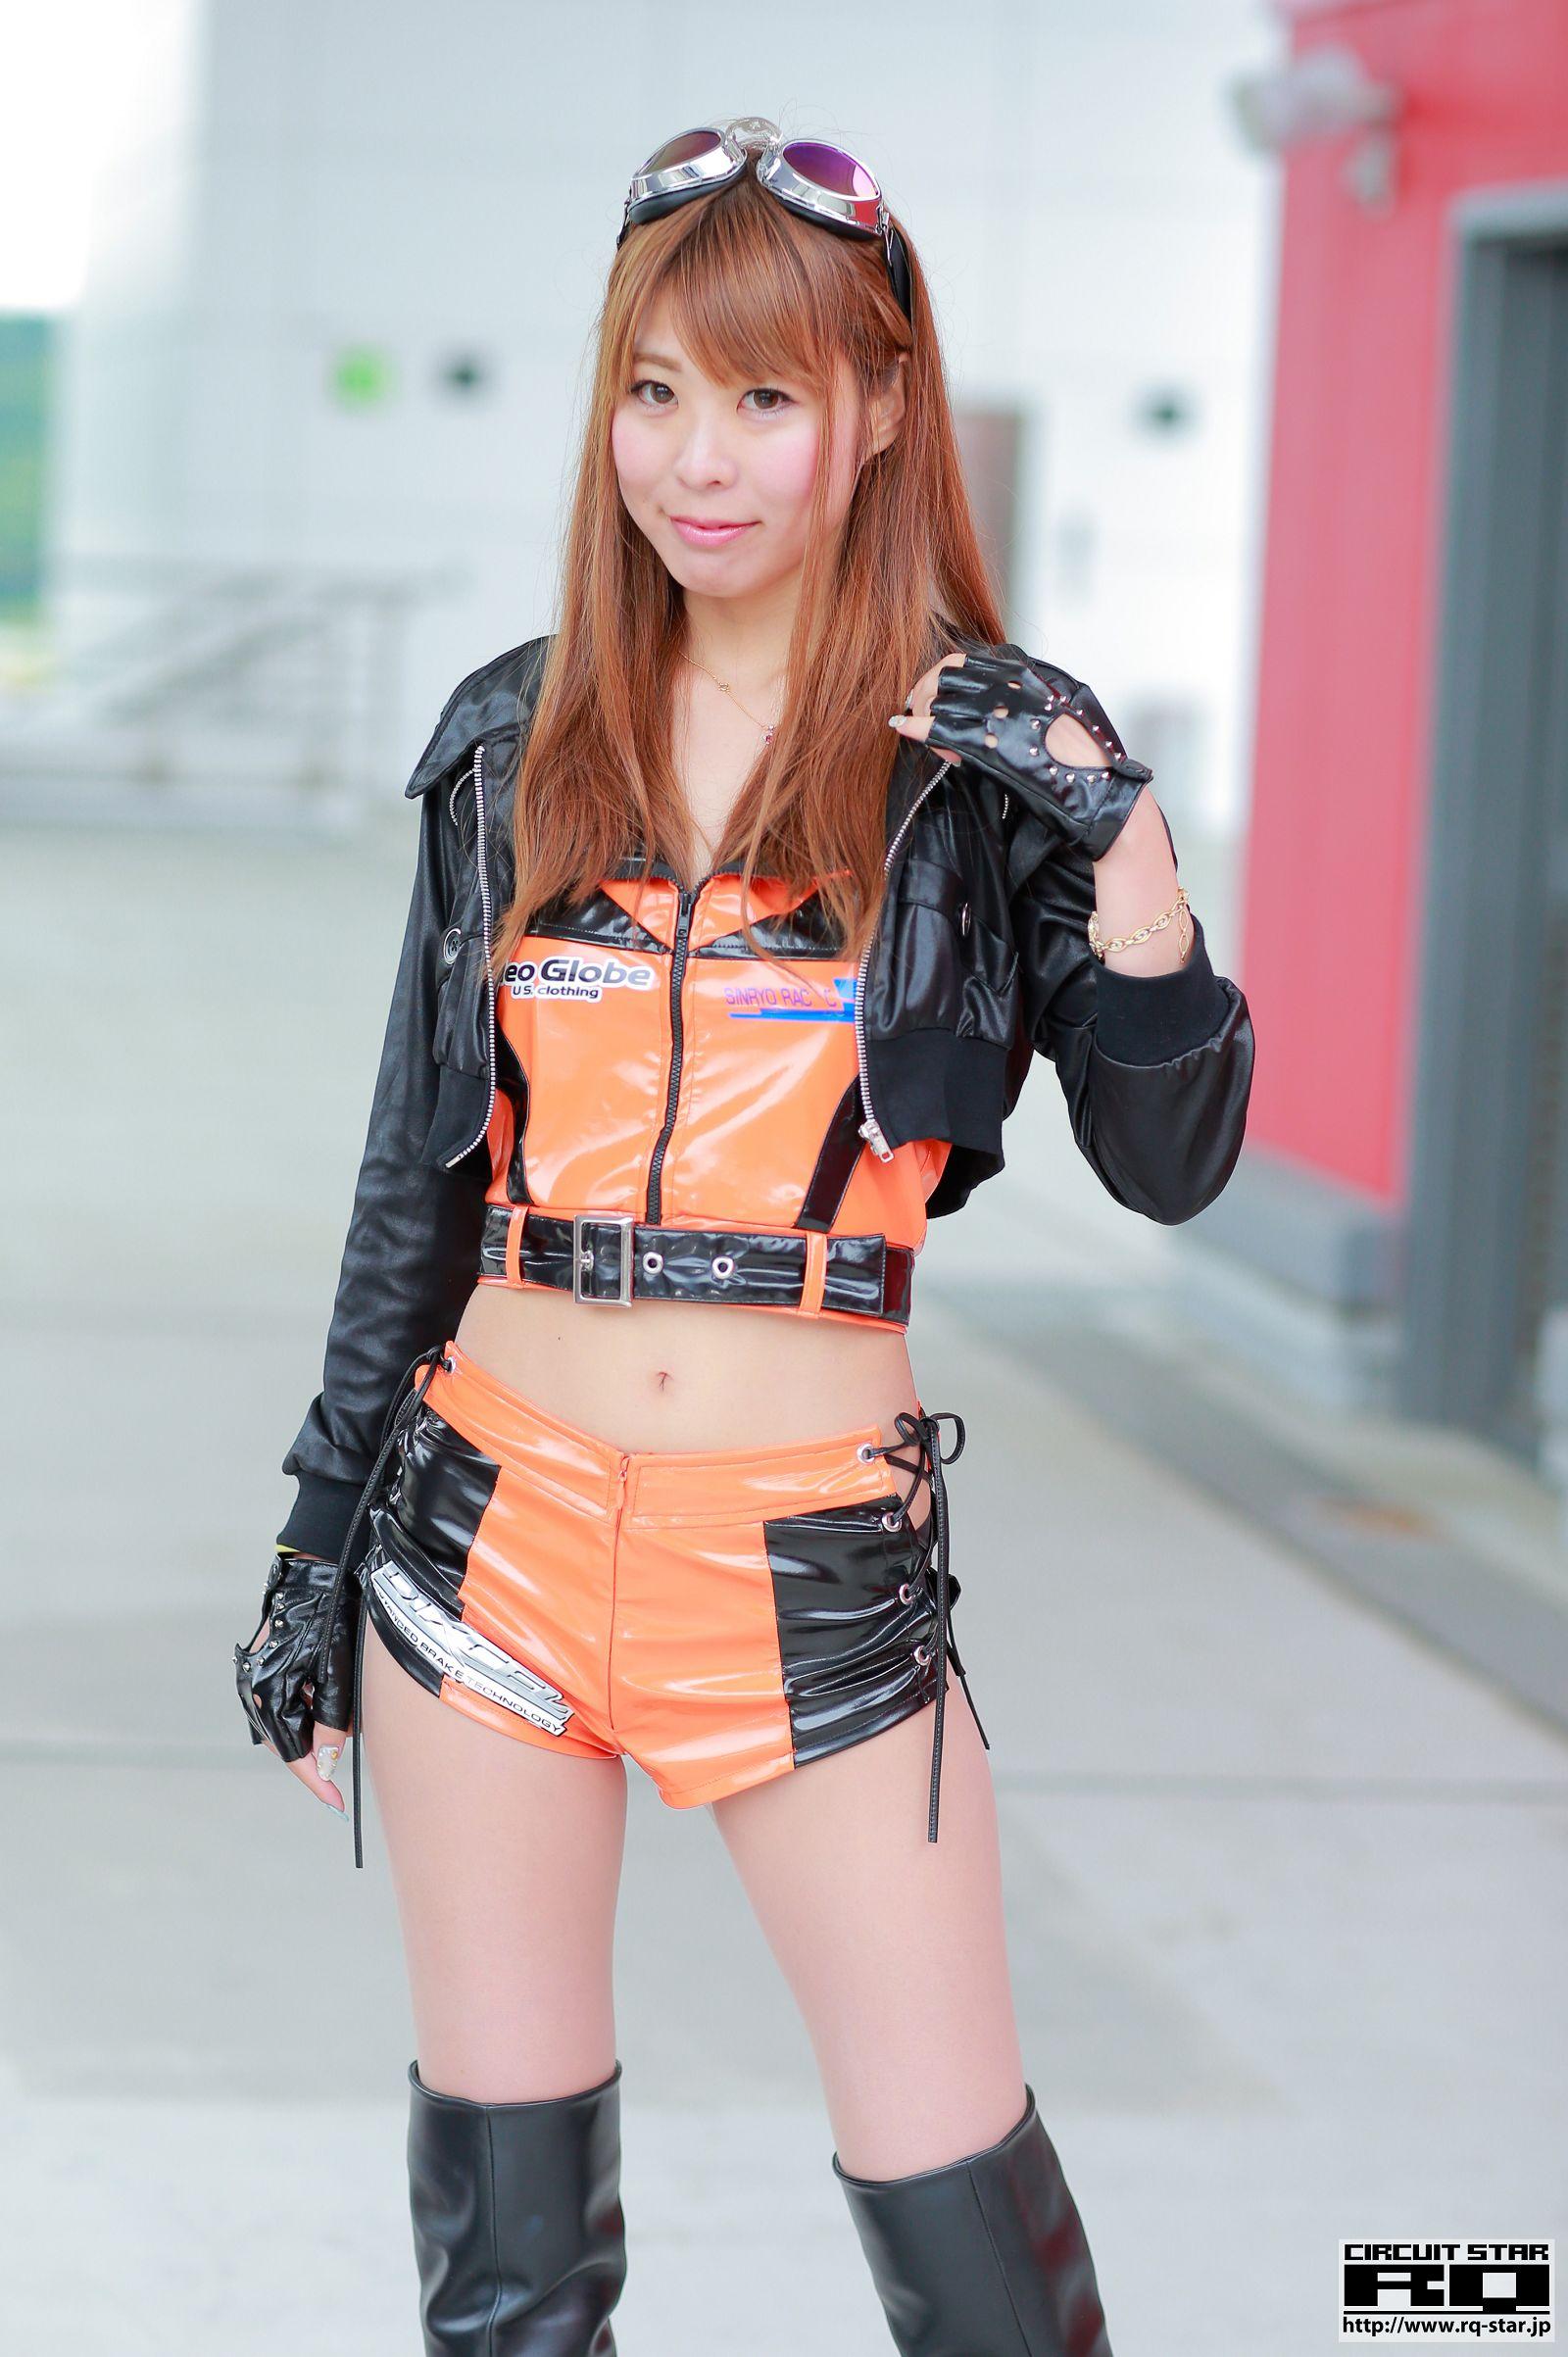 [RQ STAR美女] 2018.03.31 Chie Takeda 武田智恵 Race Queen[24P] RQ STAR 第3张